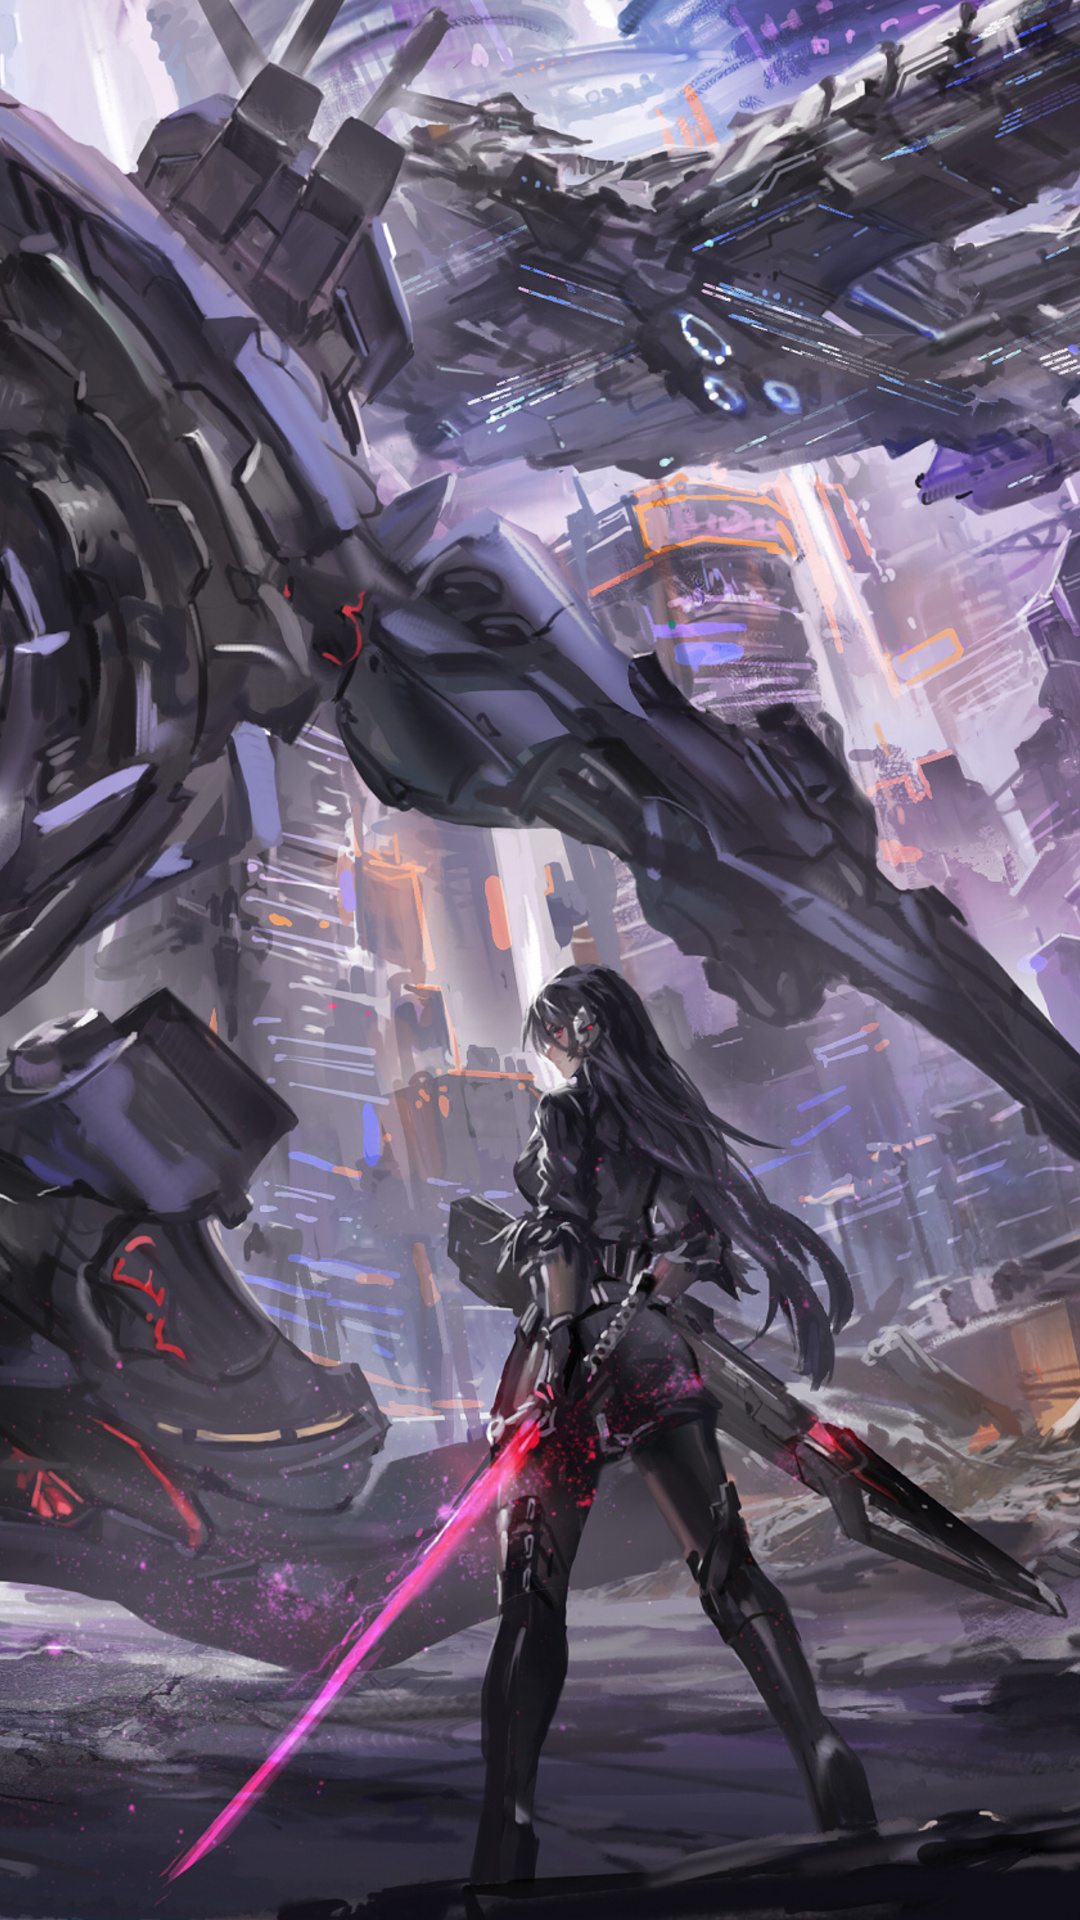 1080x1920 Robot Scifi Anime War Iphone 7,6s,6 Plus, Pixel ...